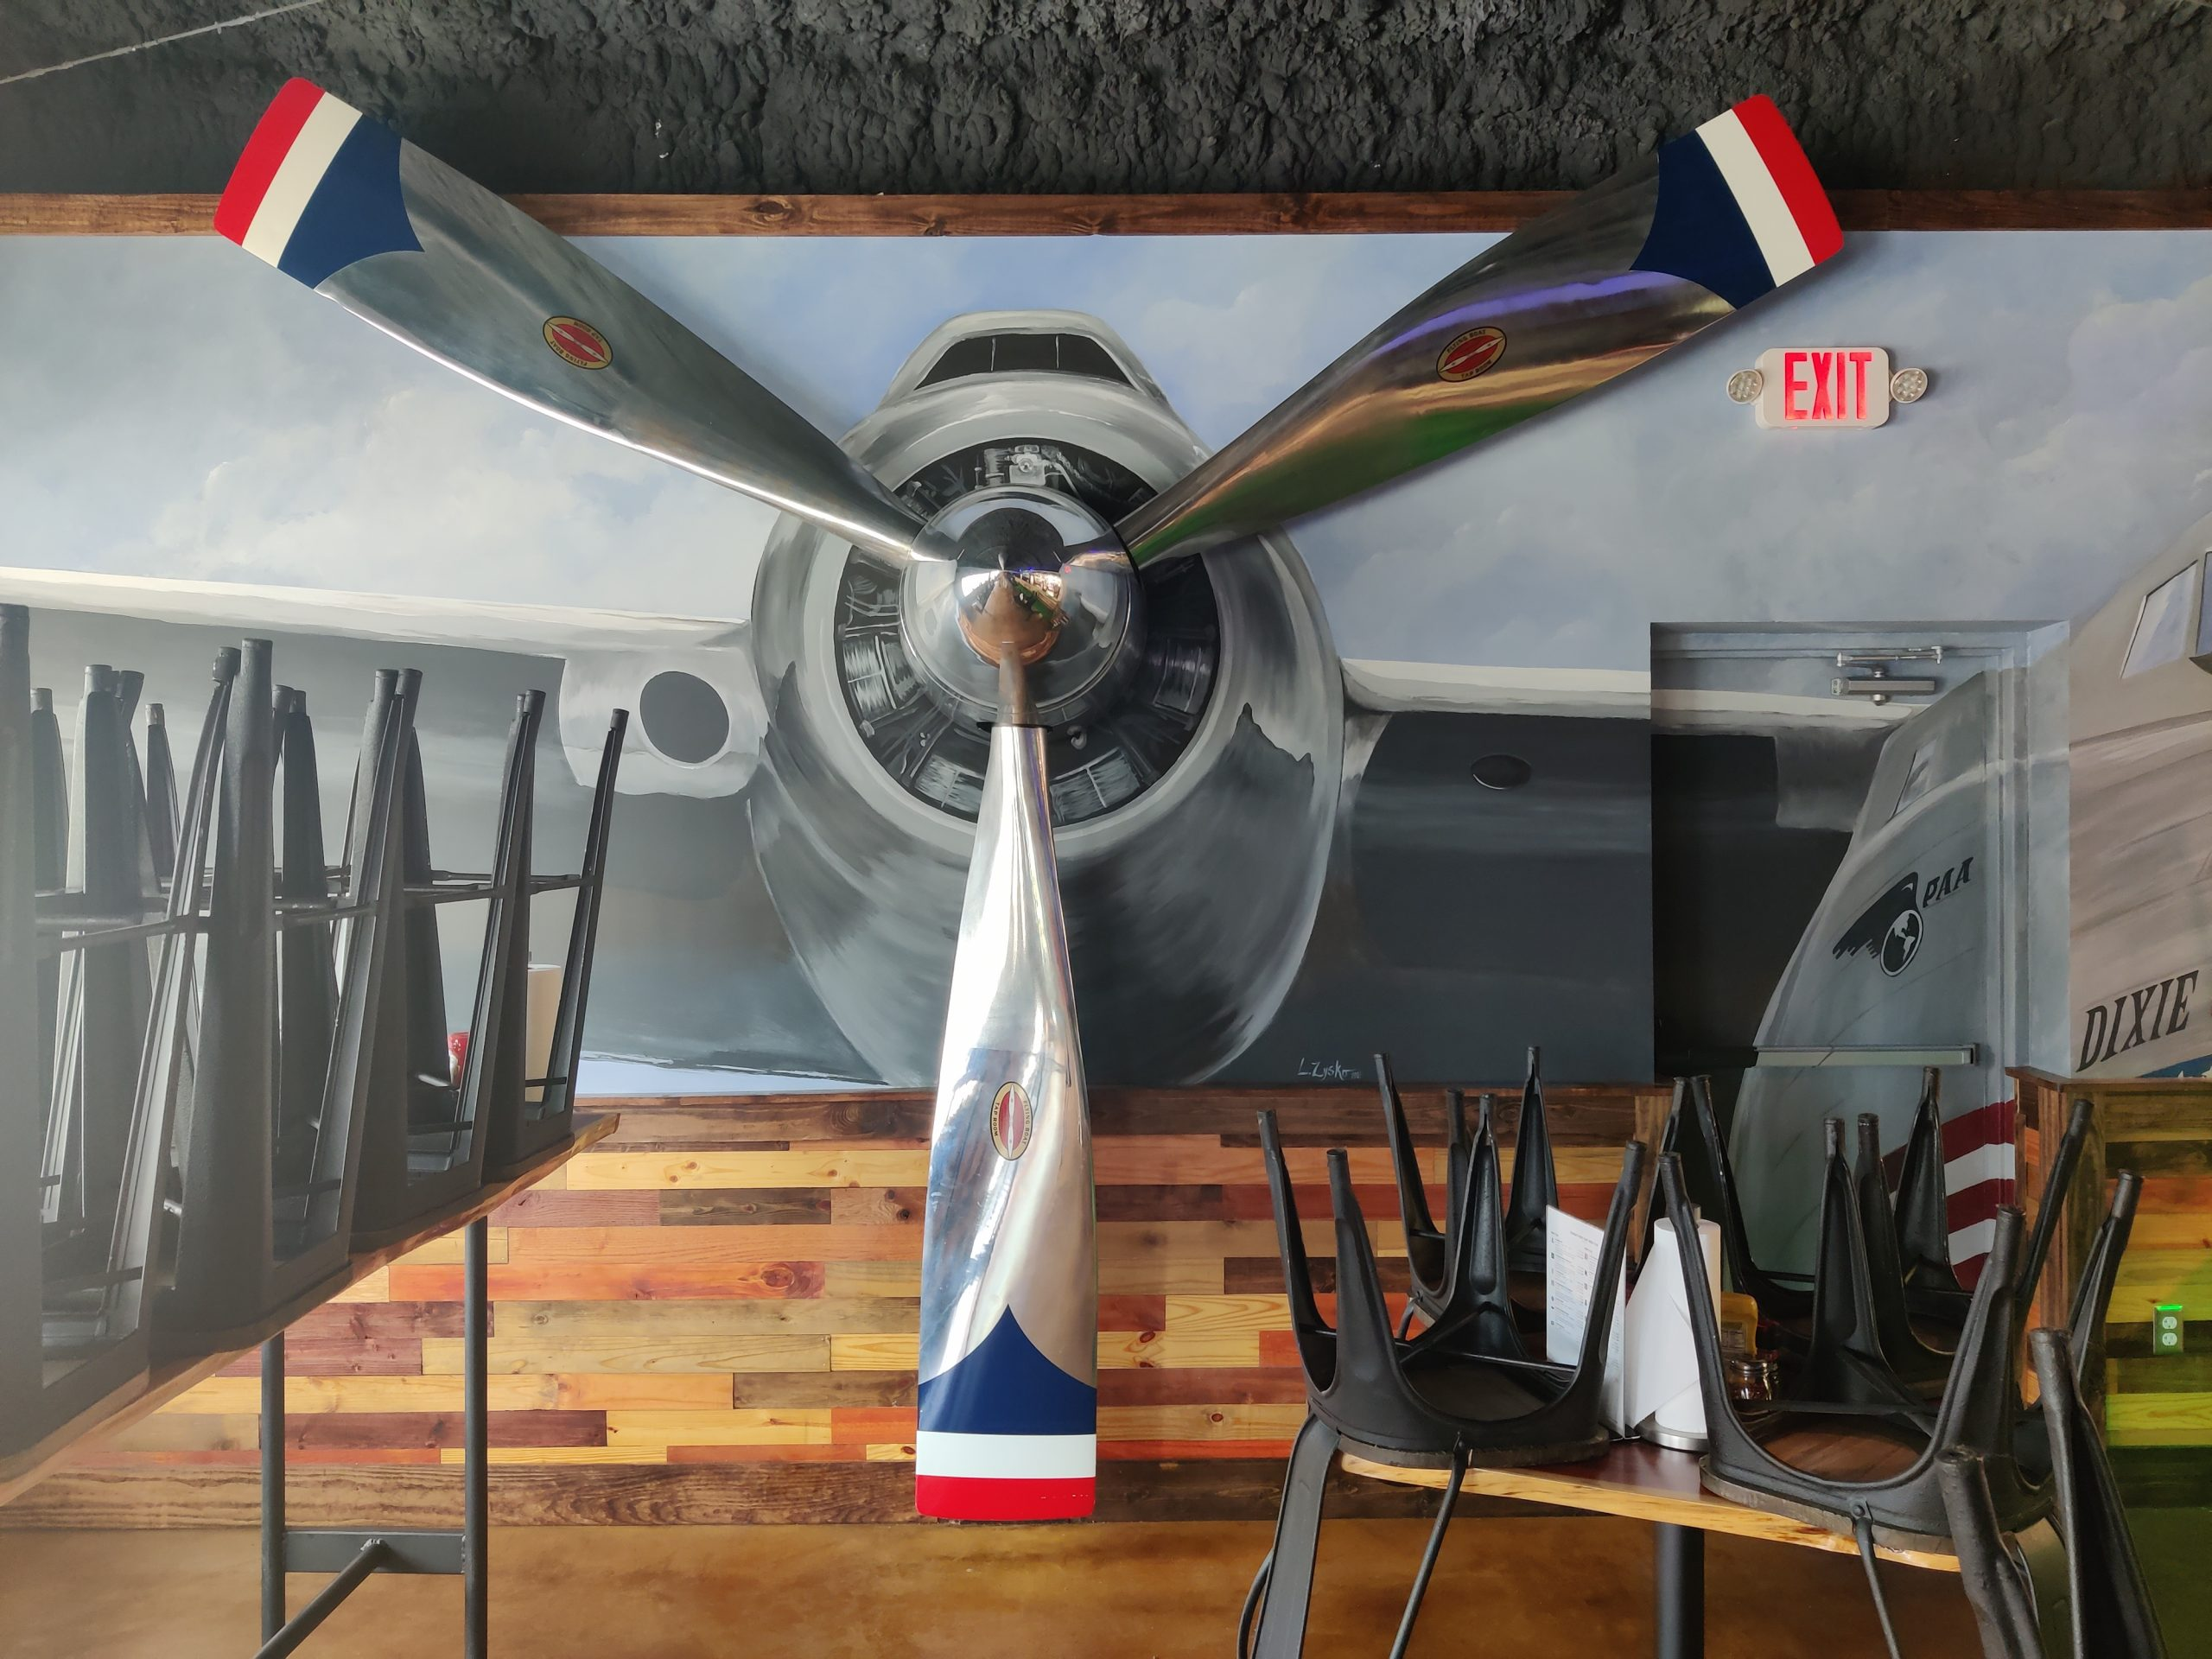 10-14-2021 Flying Boat Tap Room